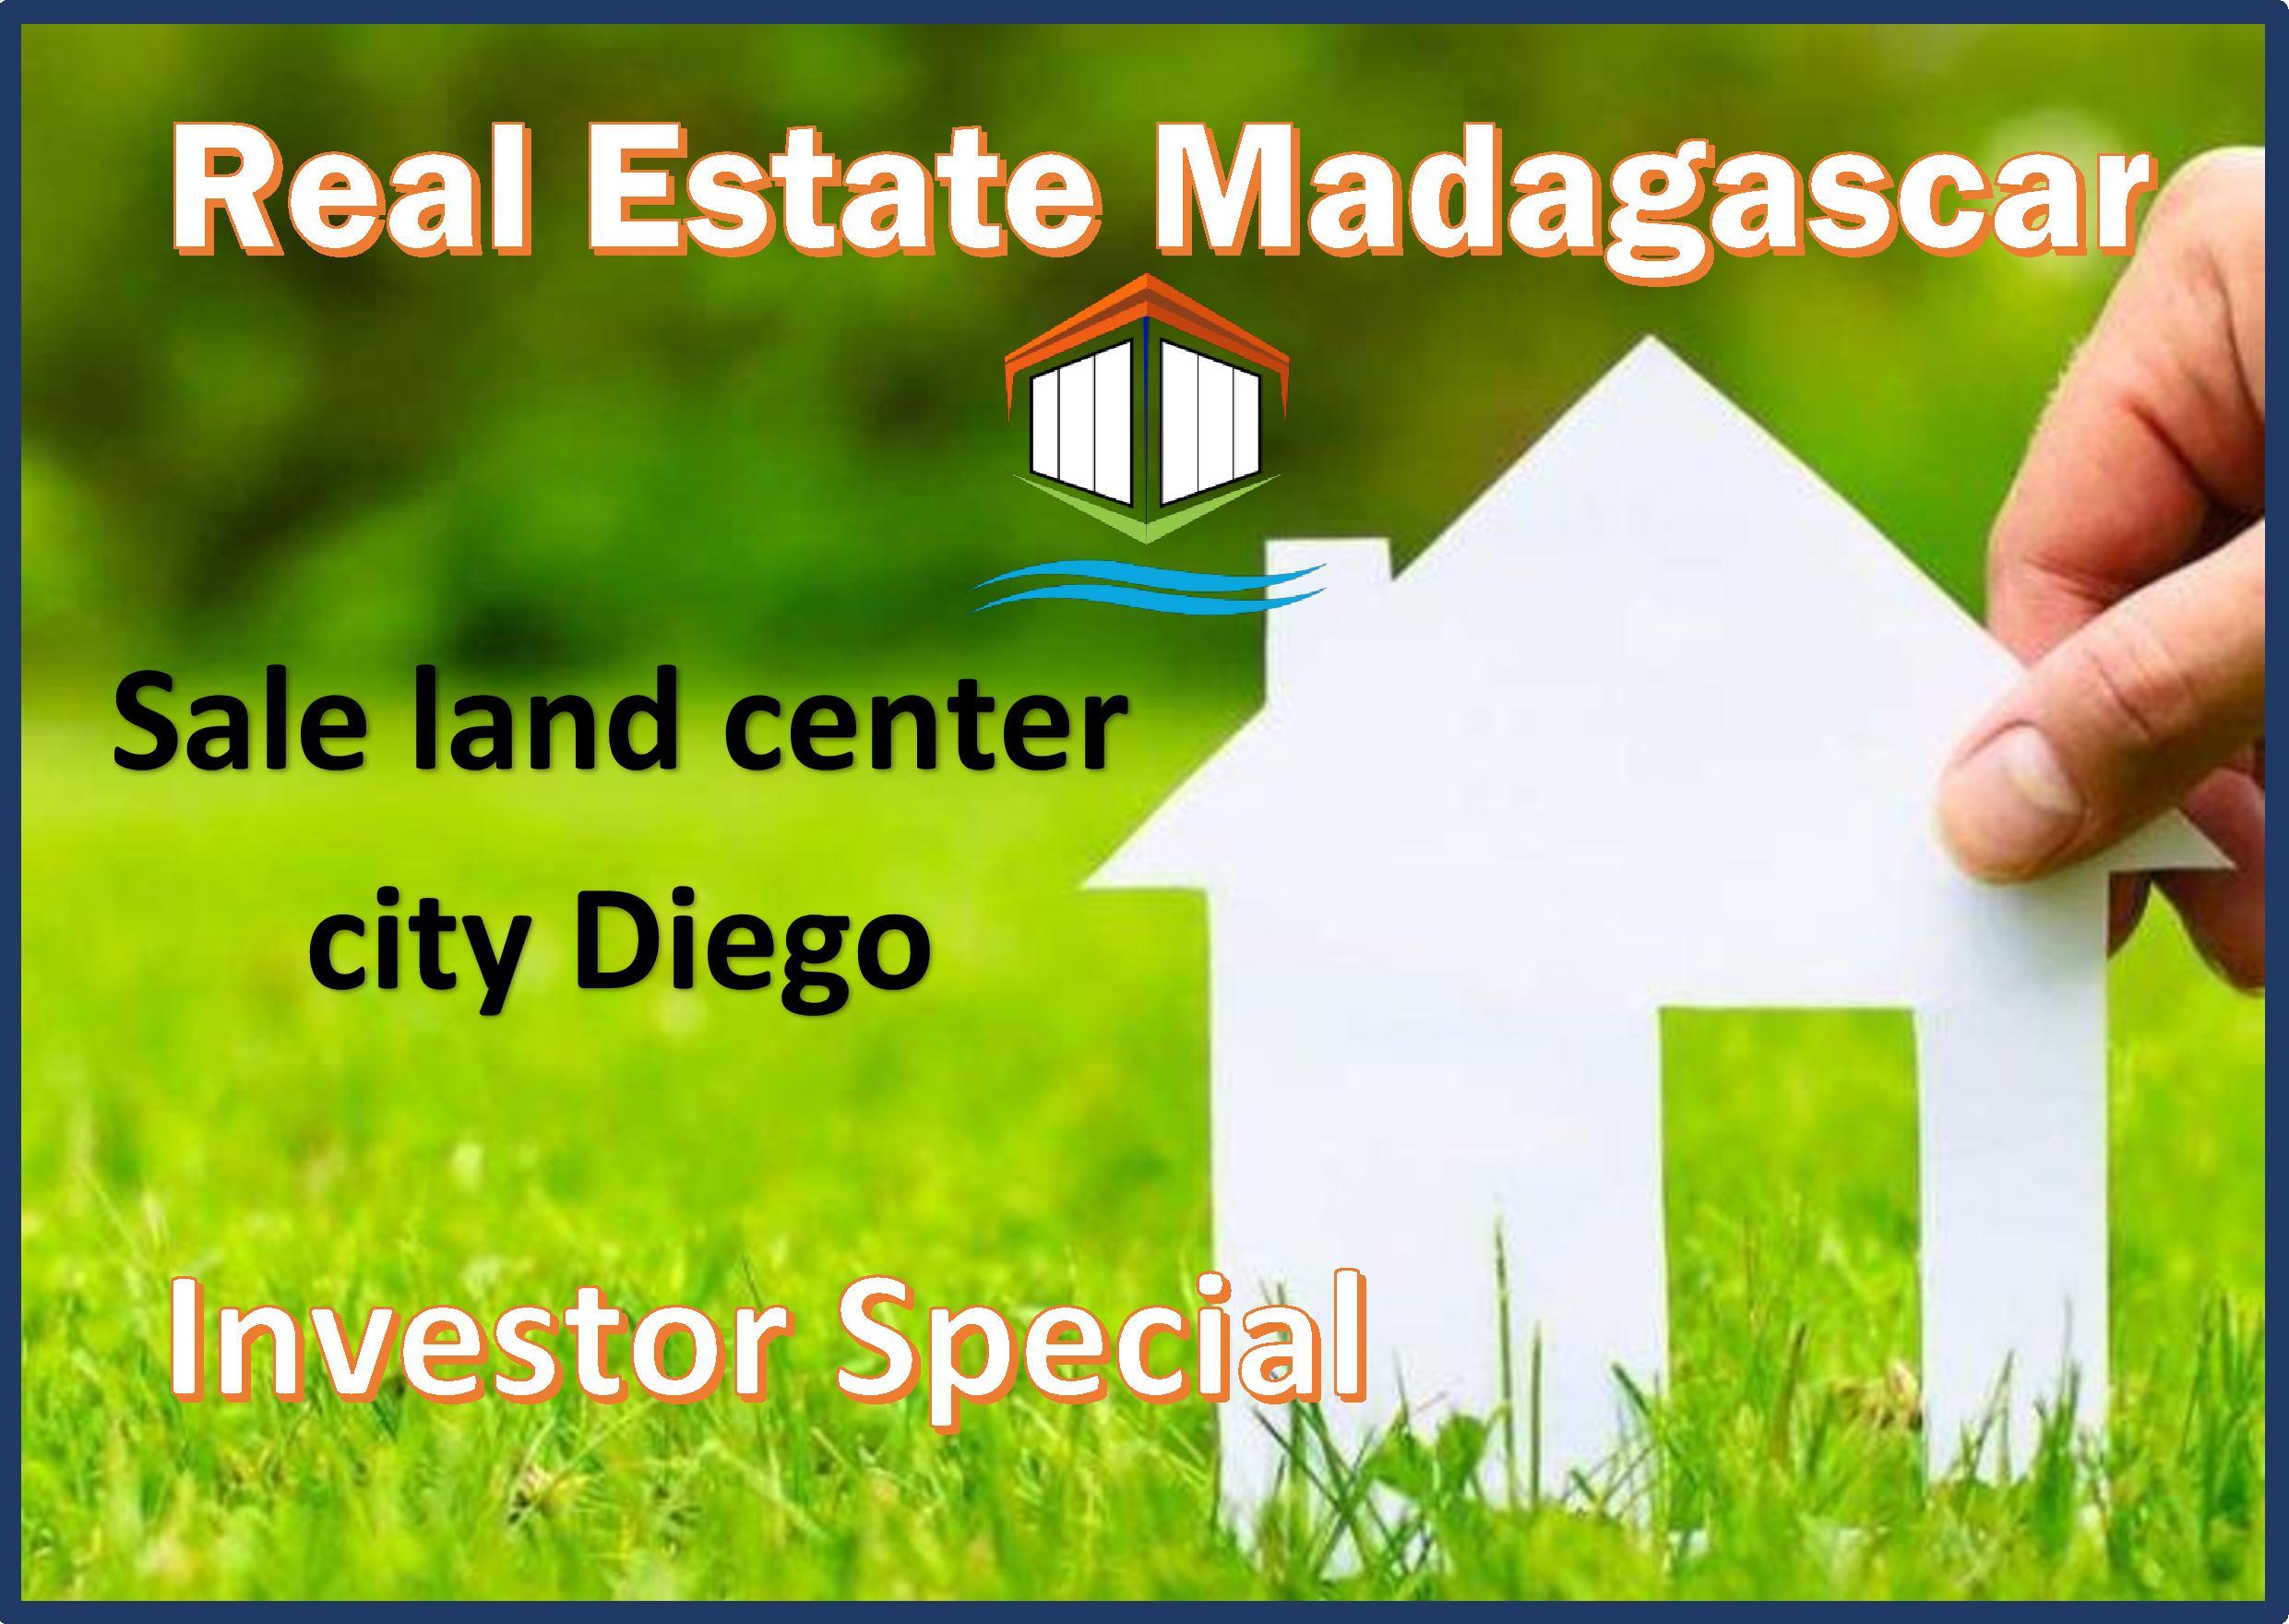 special-investor-sale-land.jpg